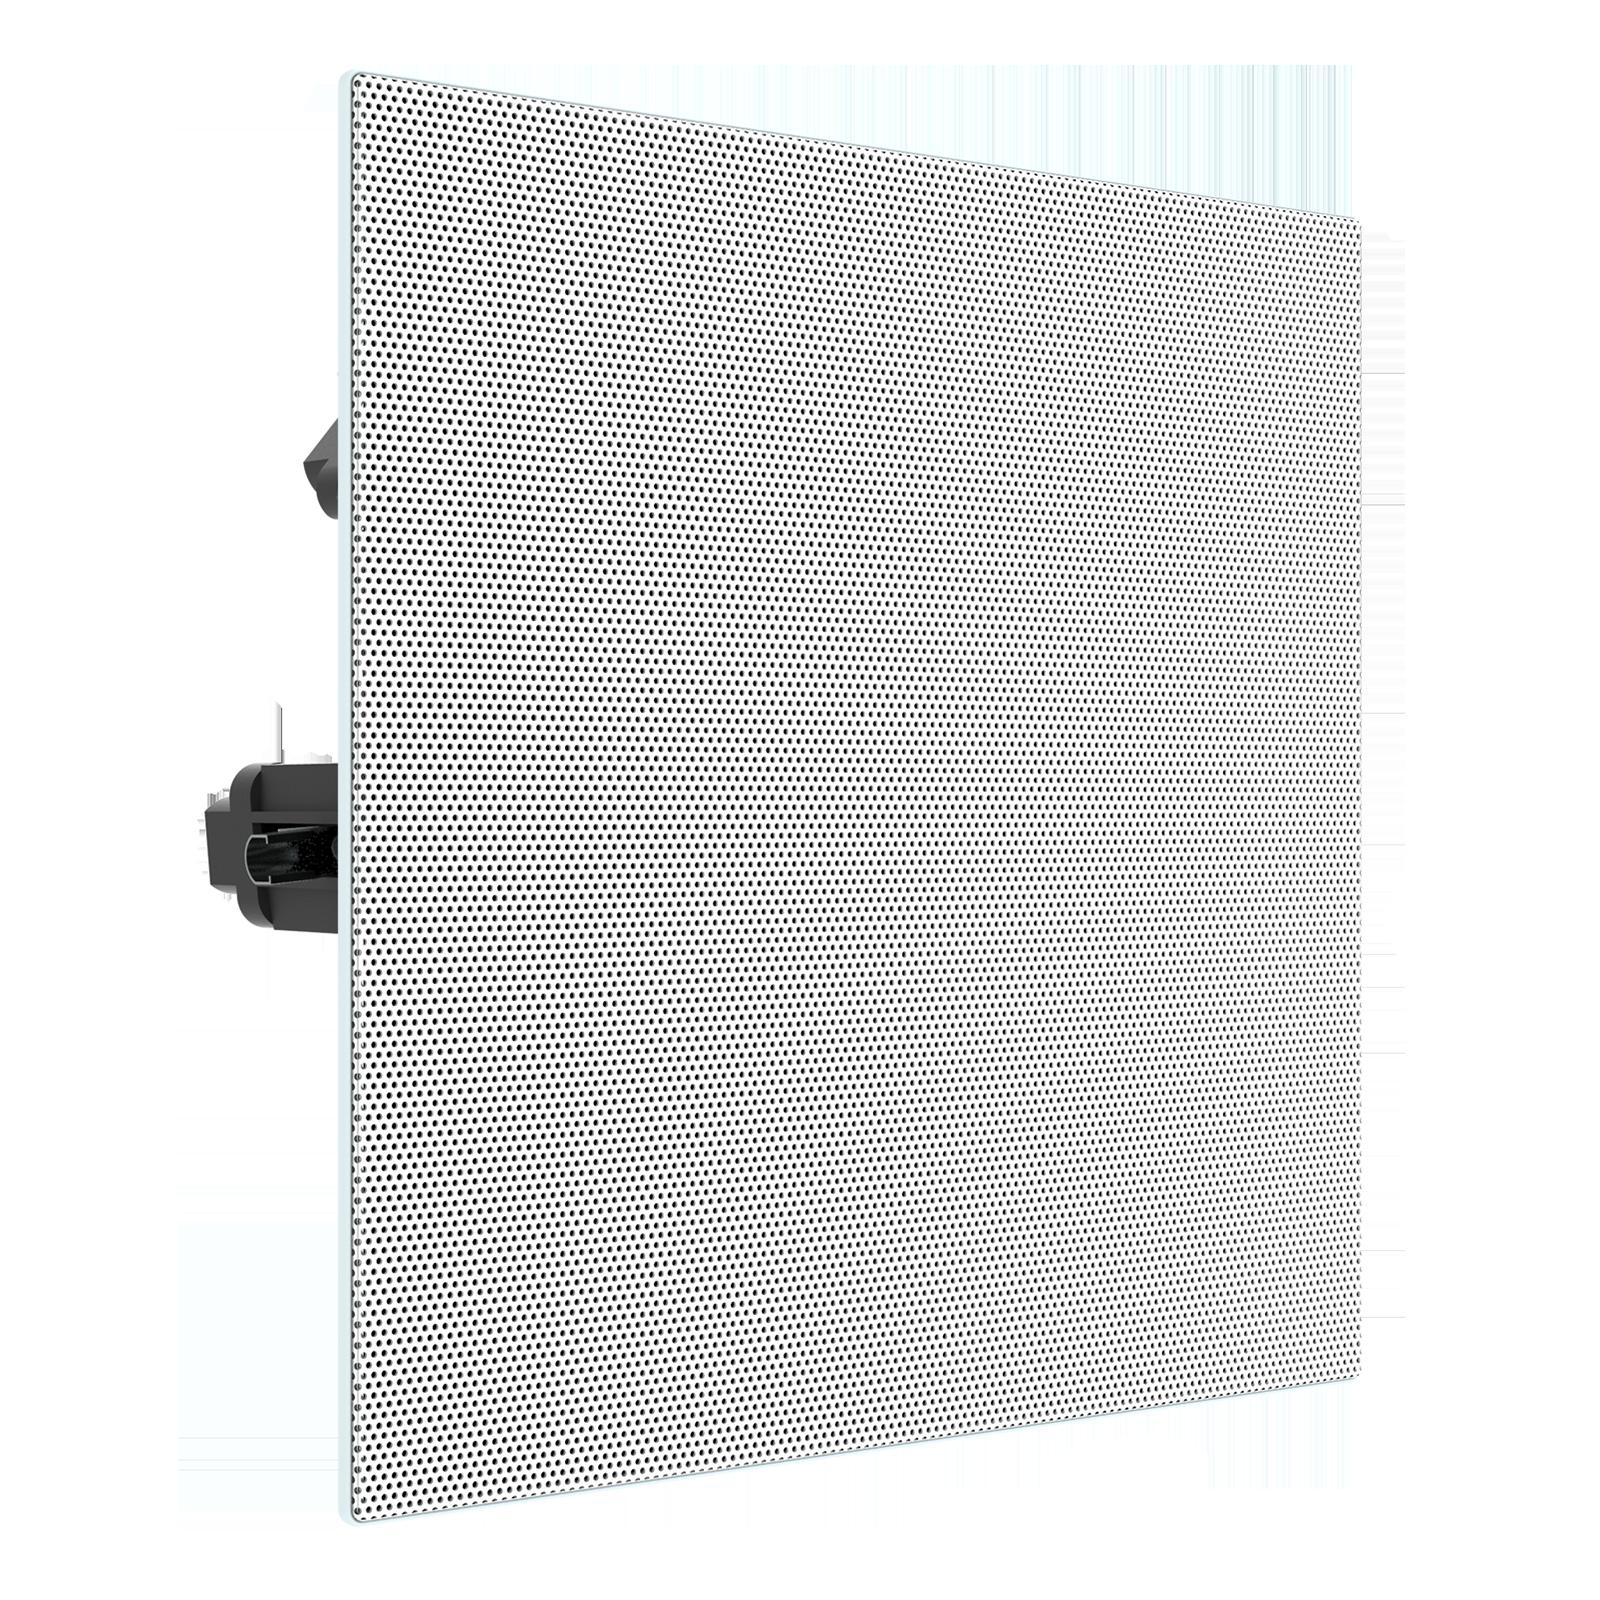 SCL-5 - Black - 2-Way 7-inch (180mm) In-Ceiling Loudspeaker - Detailshot 4